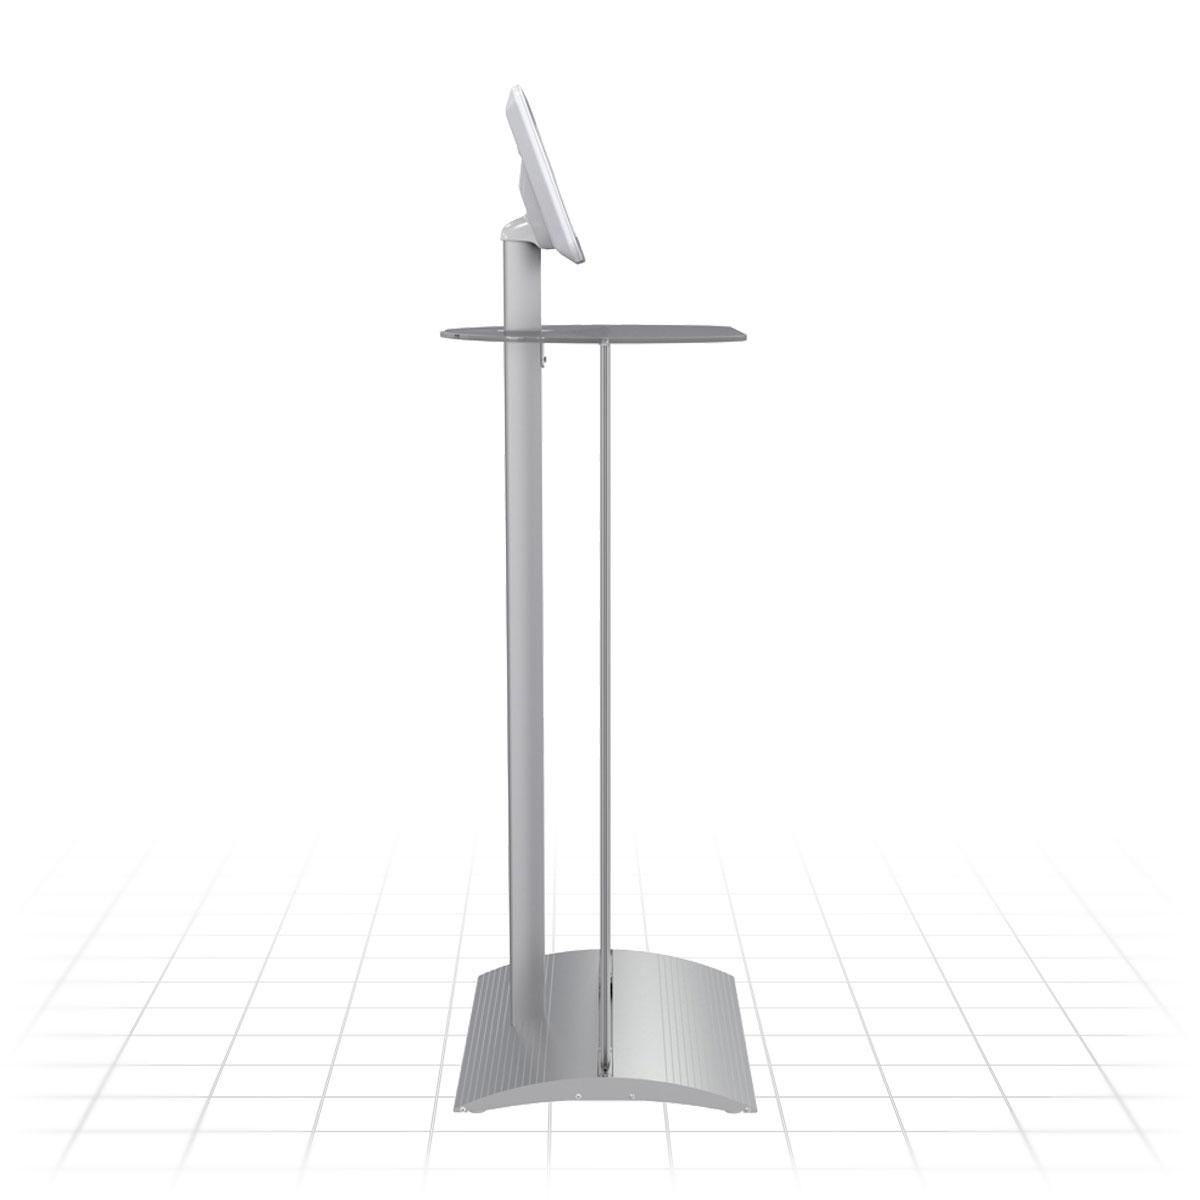 Kiosk Plus Tablet Display Stand Tablet Display Stands